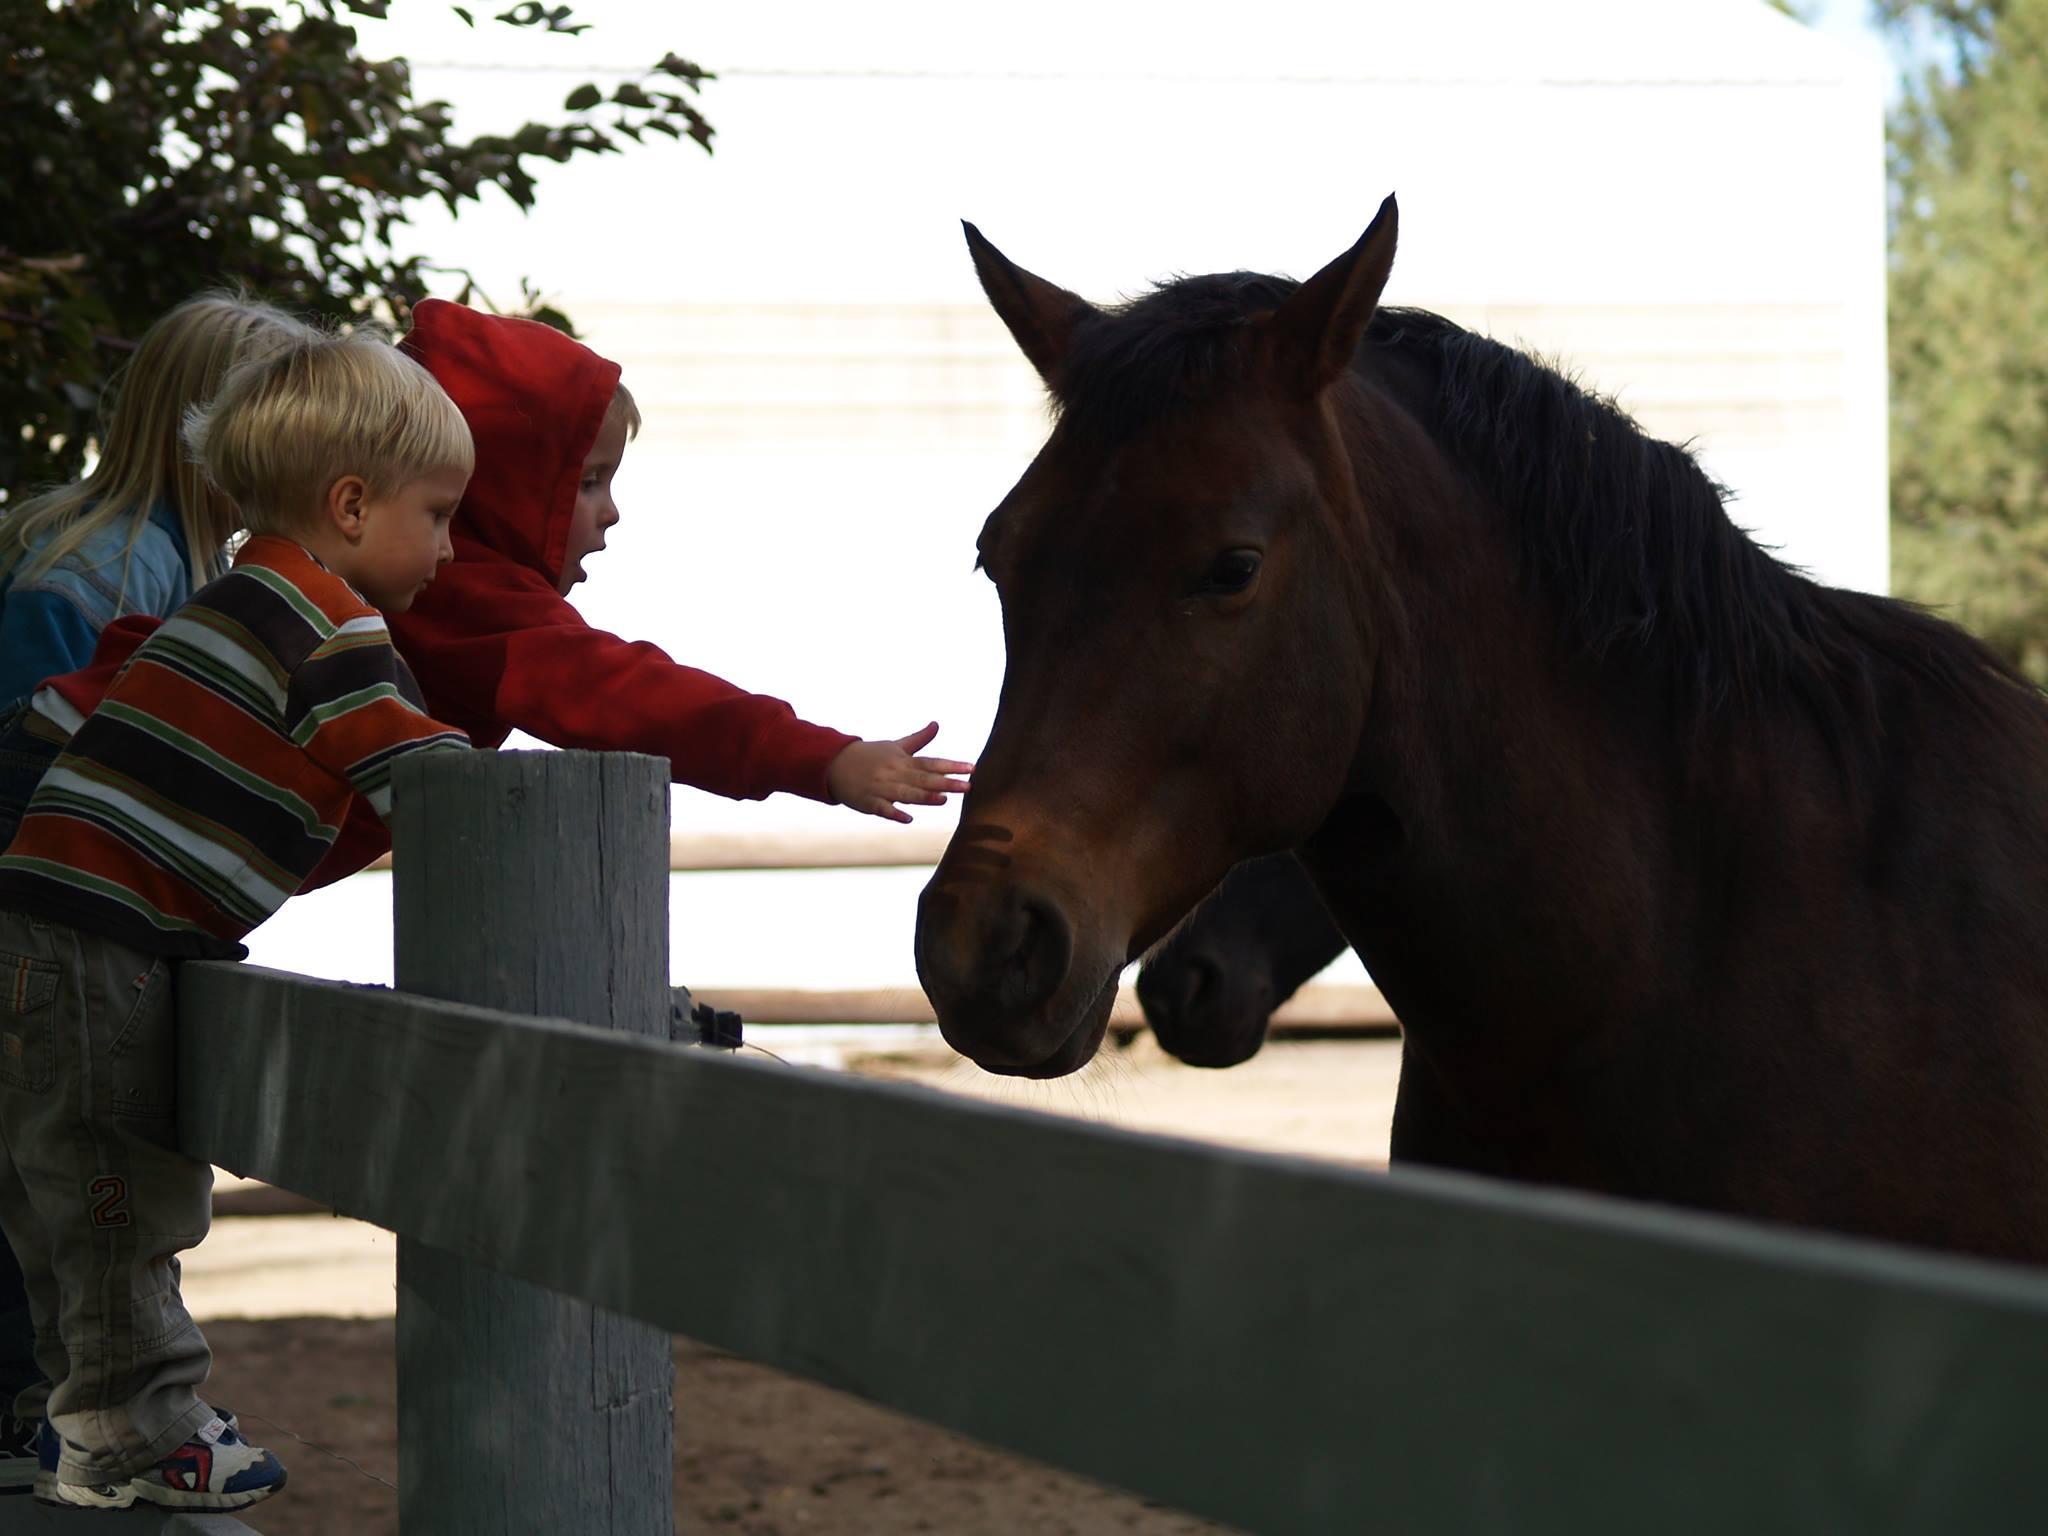 kids-petting-horse.jpg